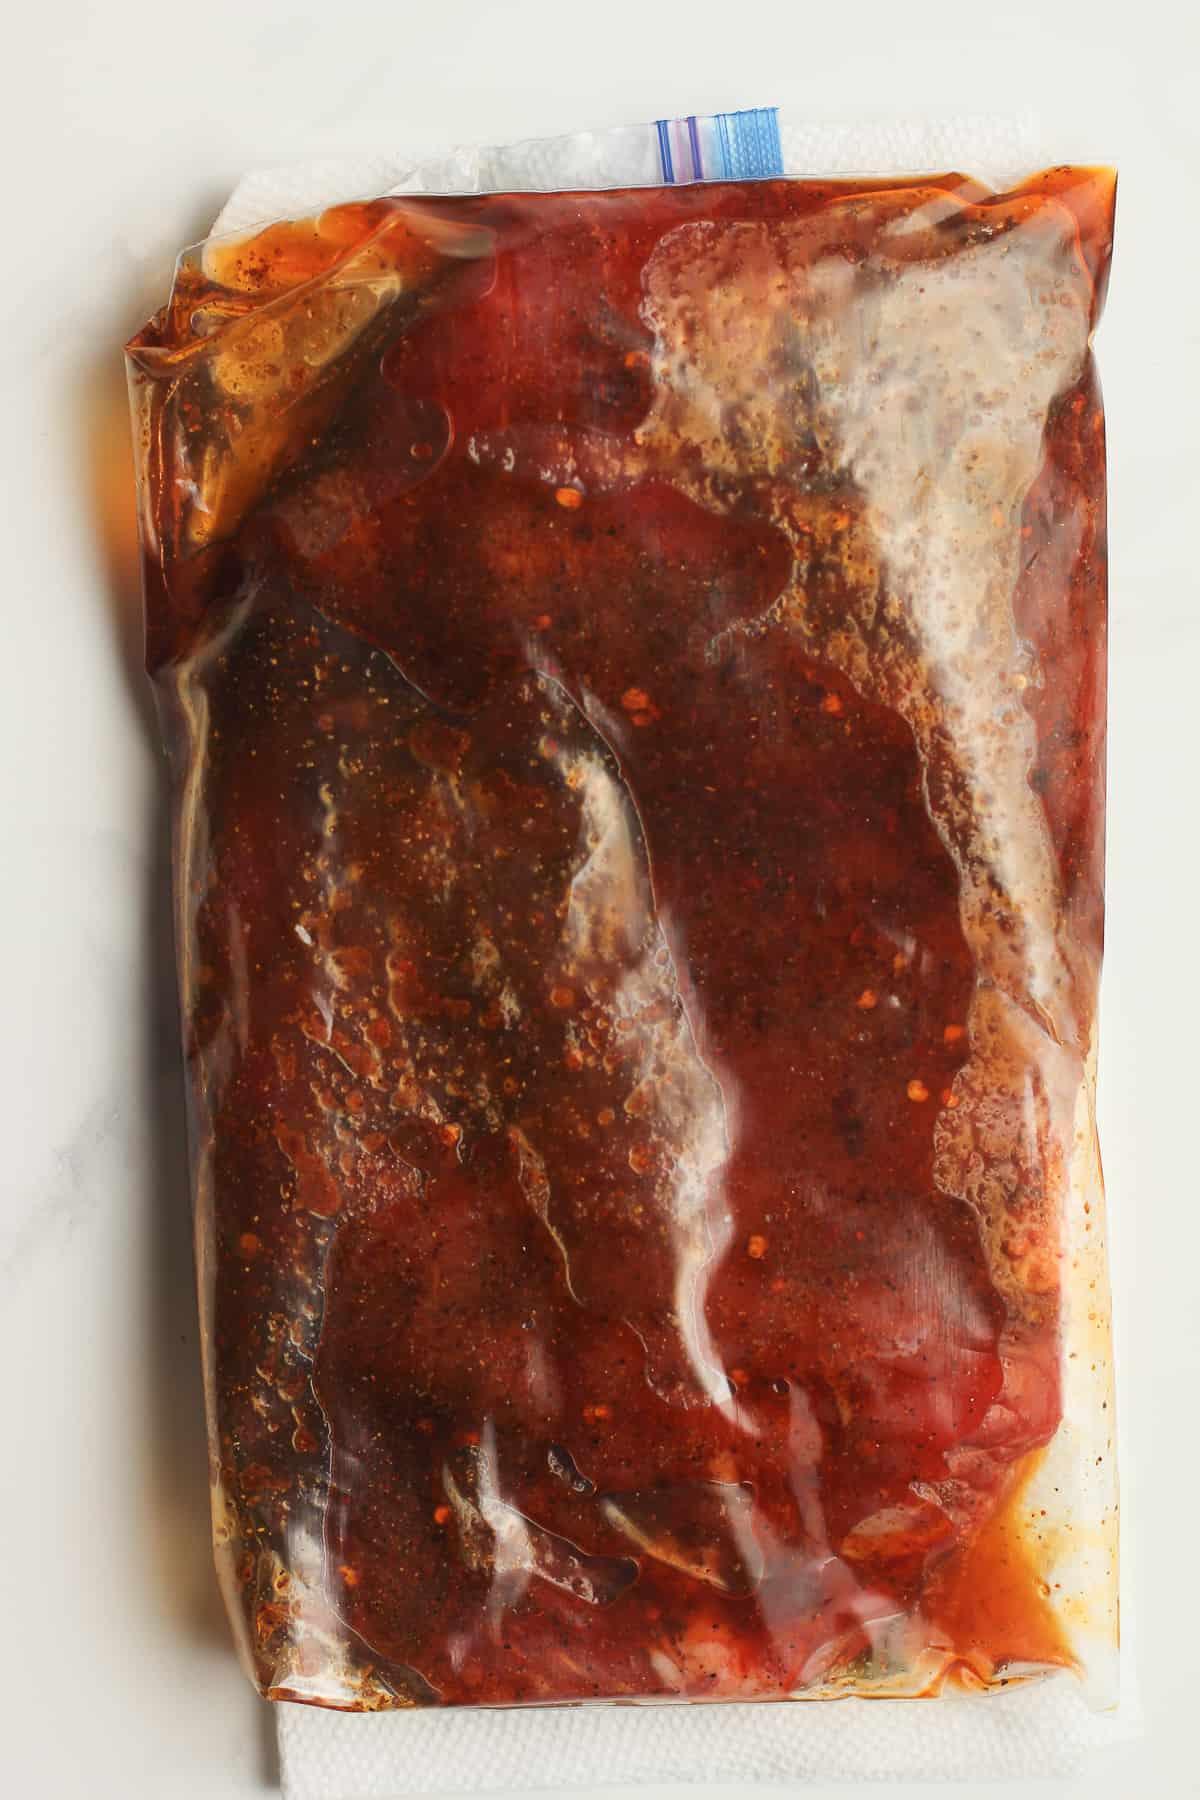 A bag of marinated flank steak.